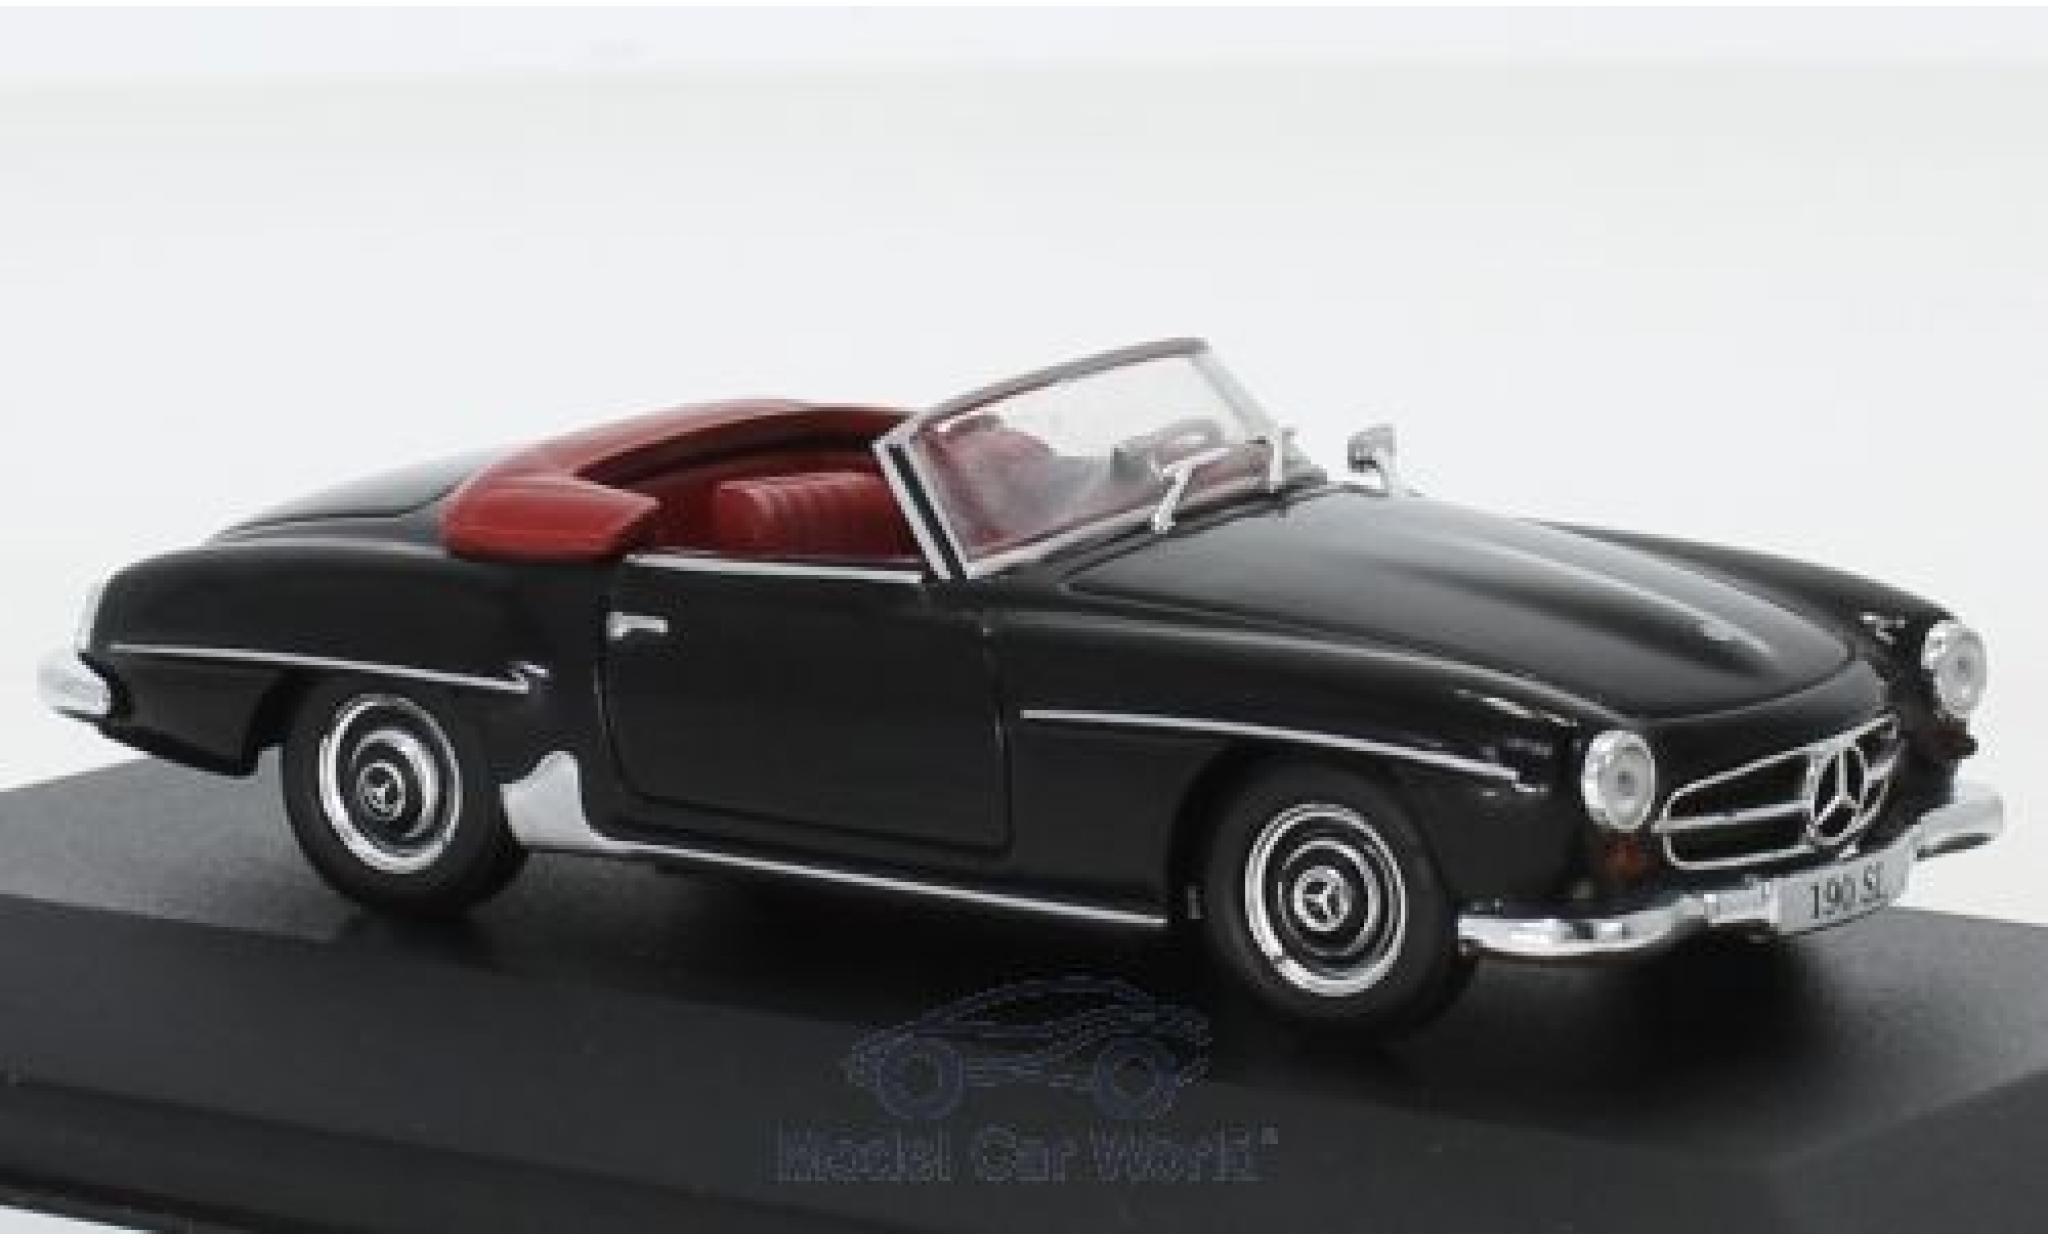 Mercedes 190 1/43 Pct SL (W121) negro 1955